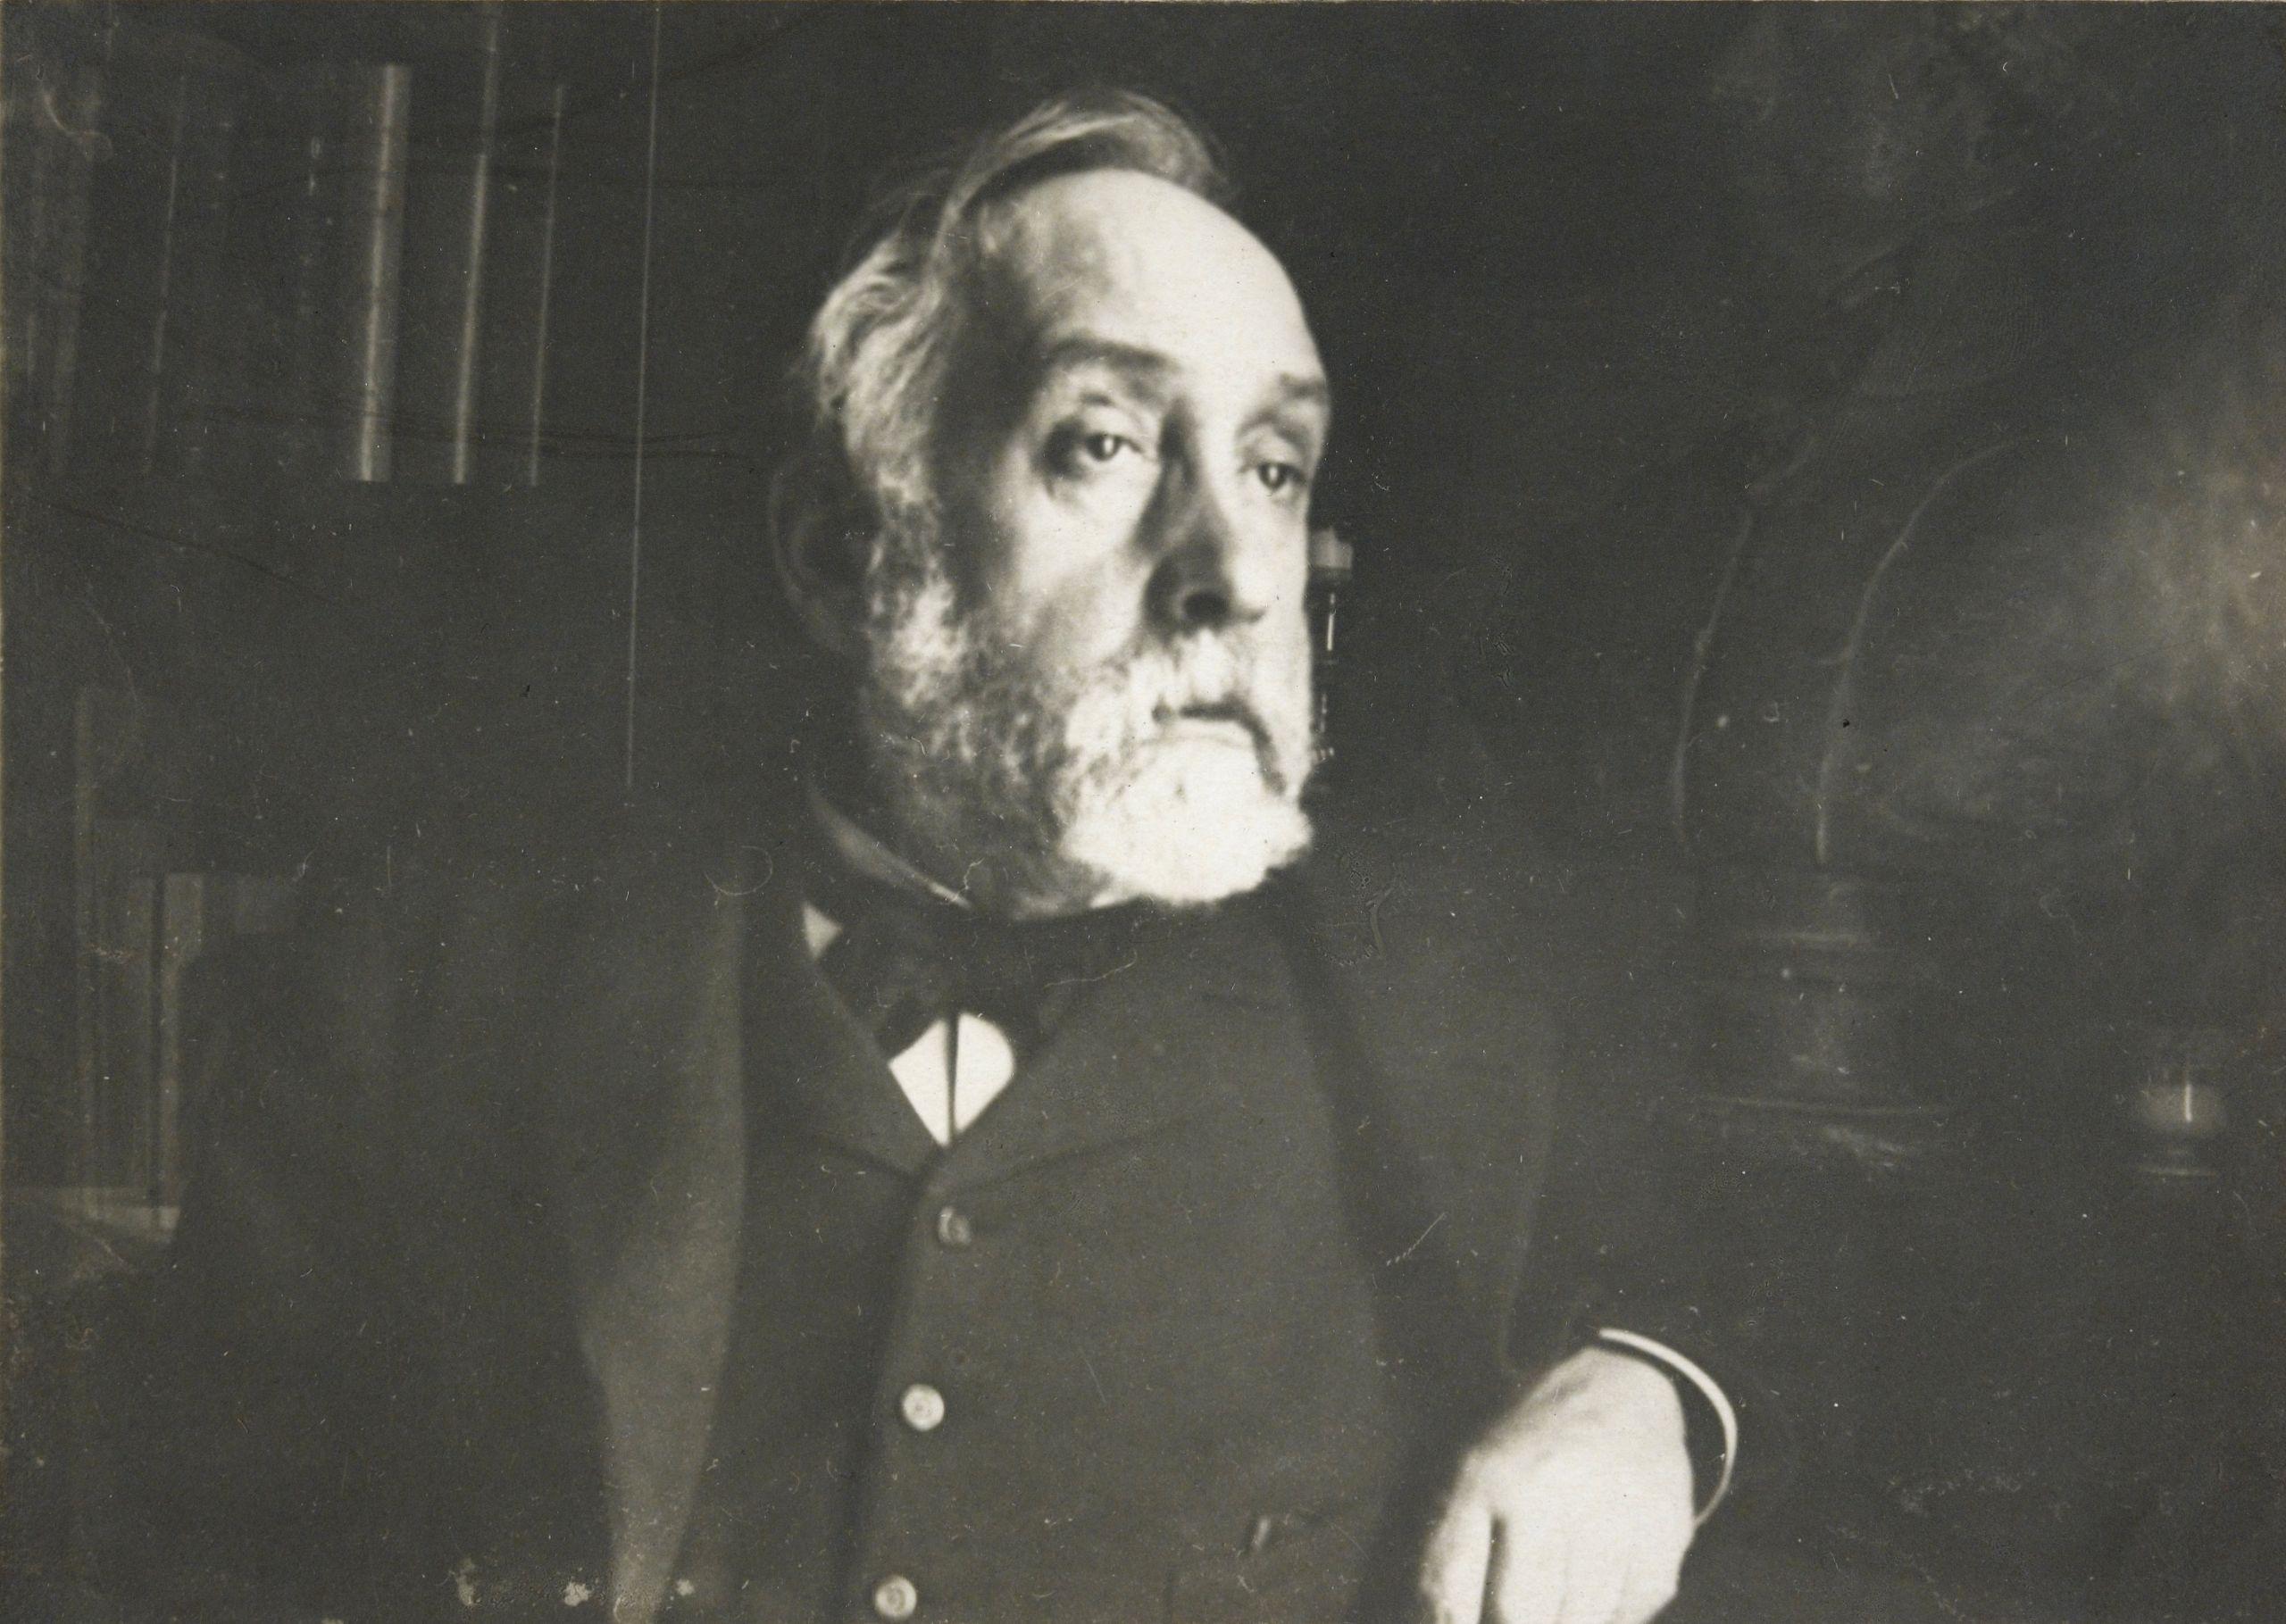 Edgar Degas self portrait photograph